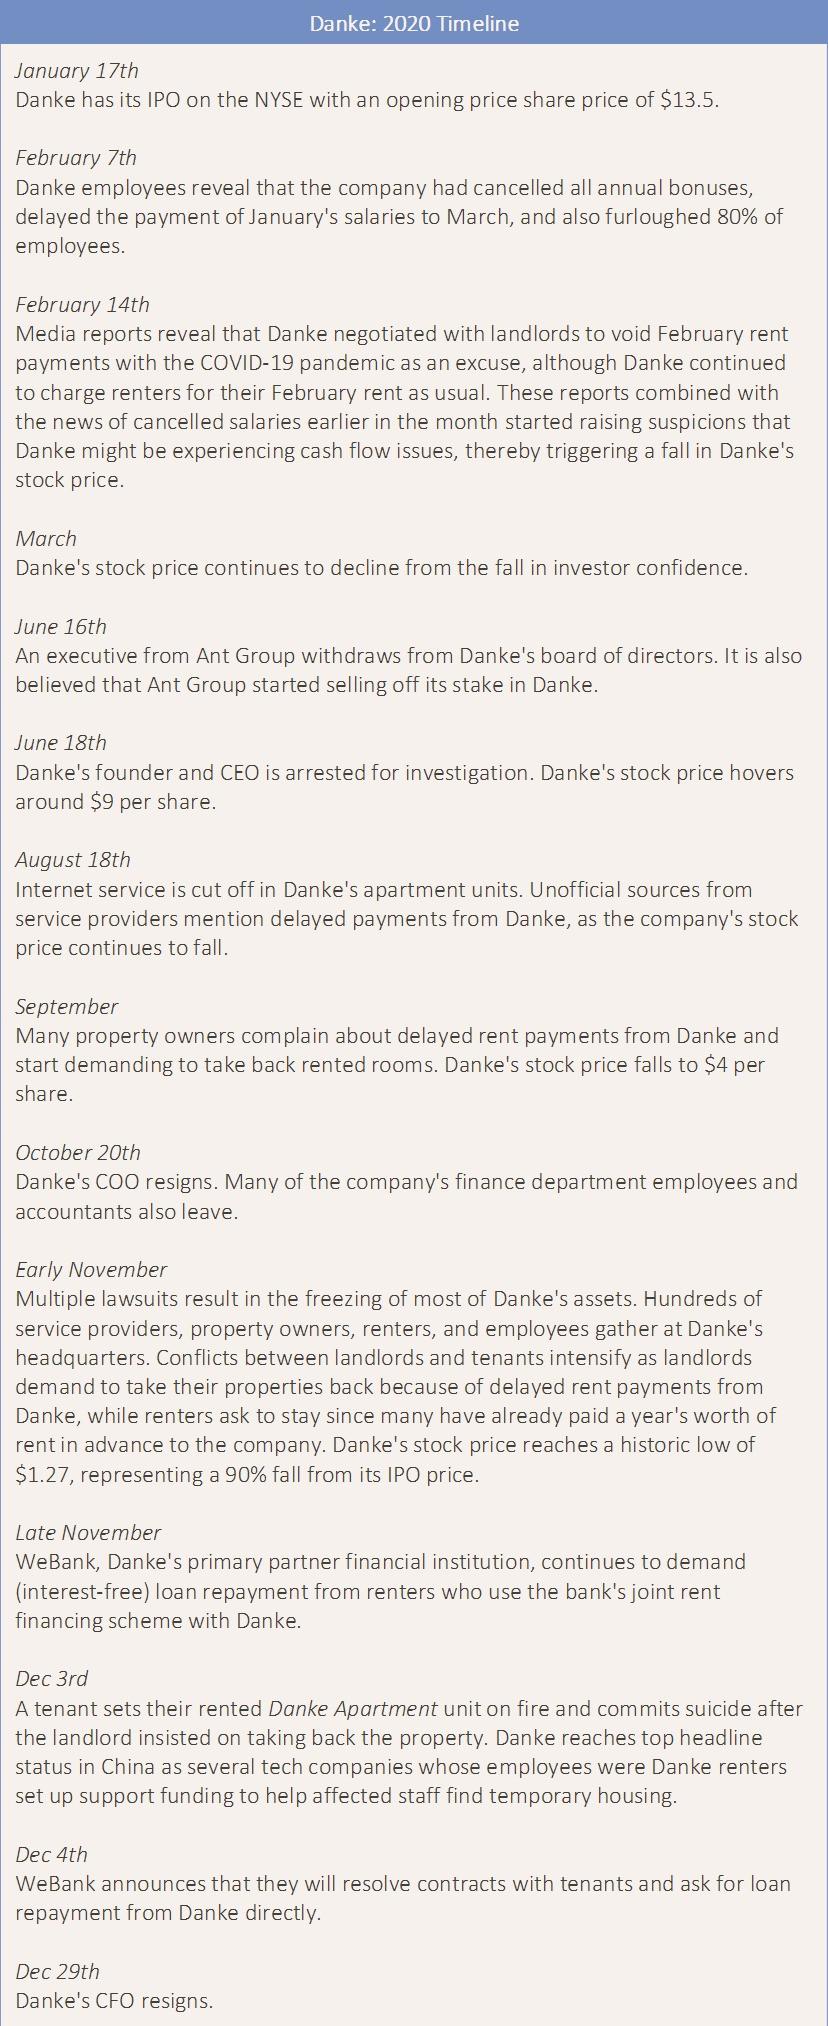 Timeline of Danke's collapse